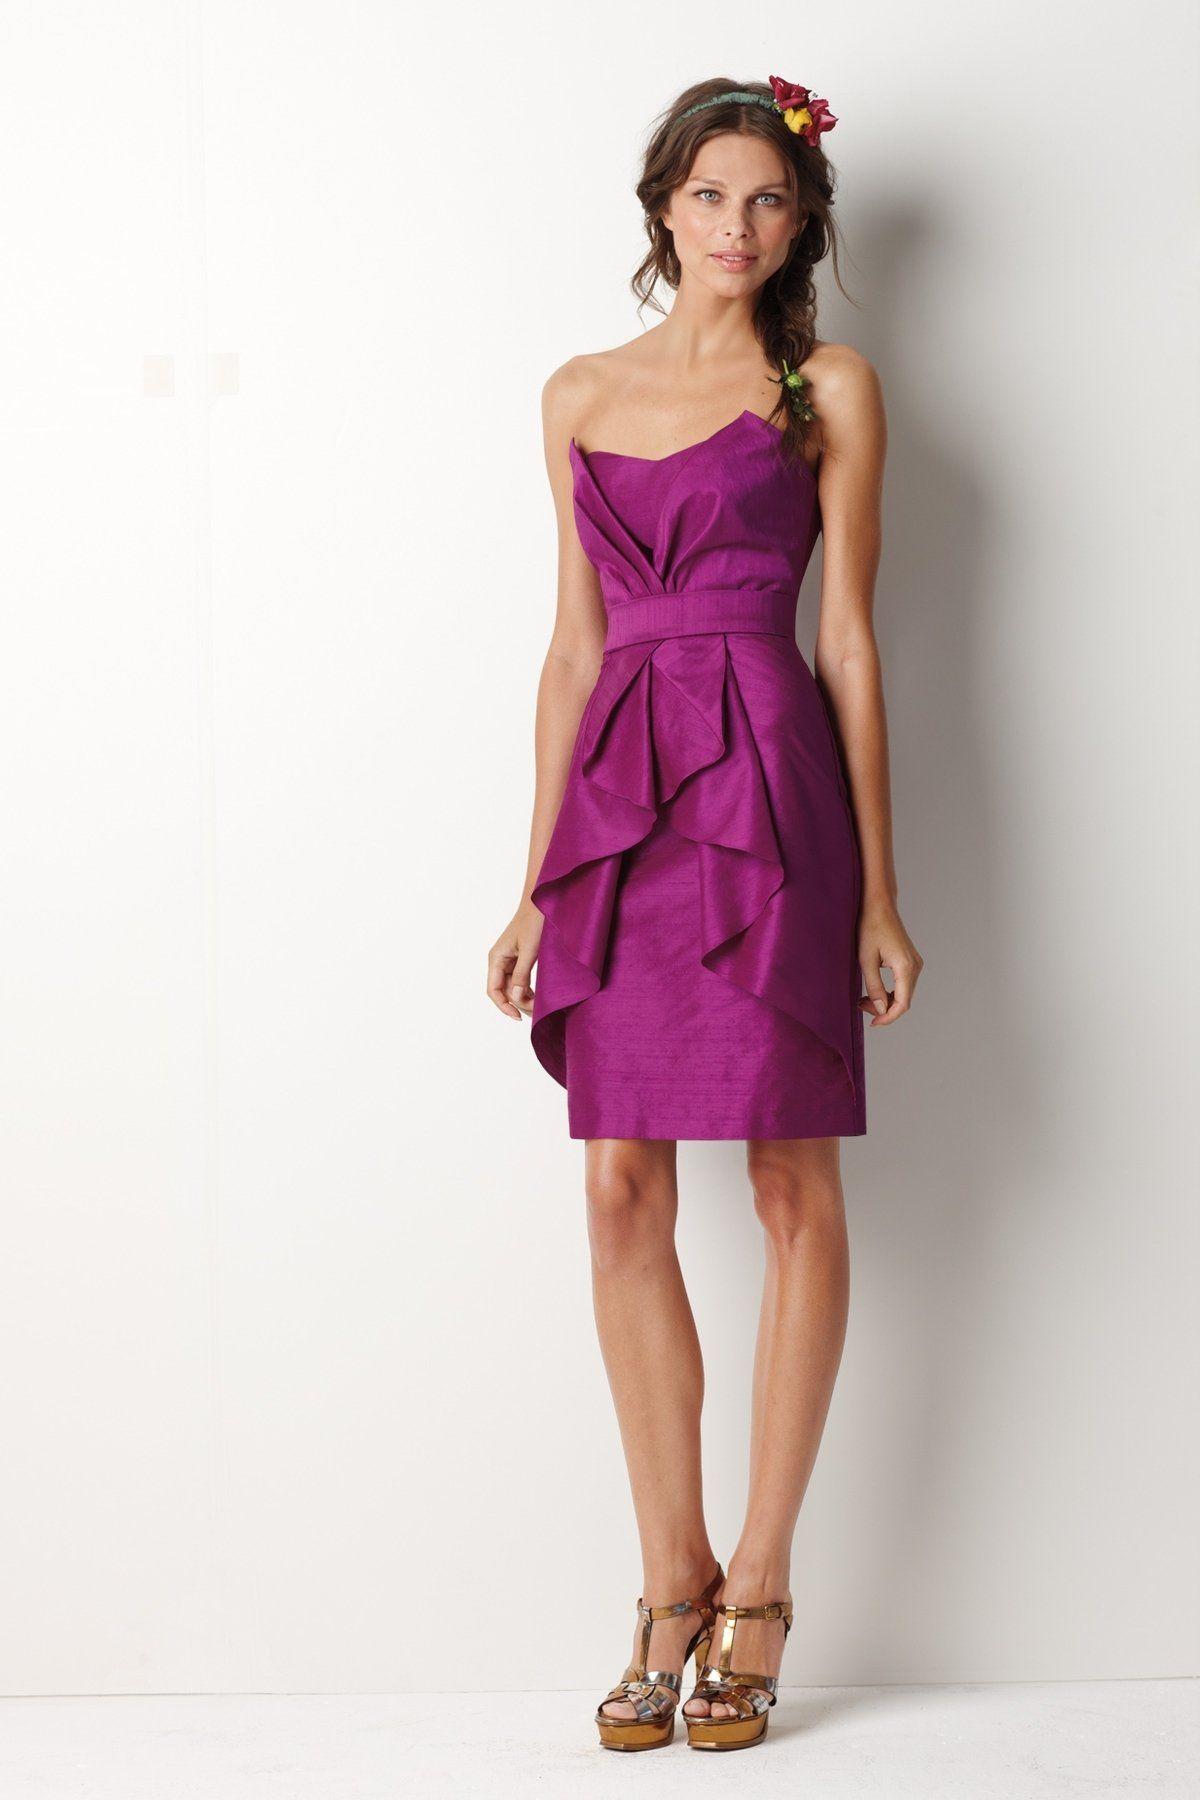 Dupioni silk cocktail dress